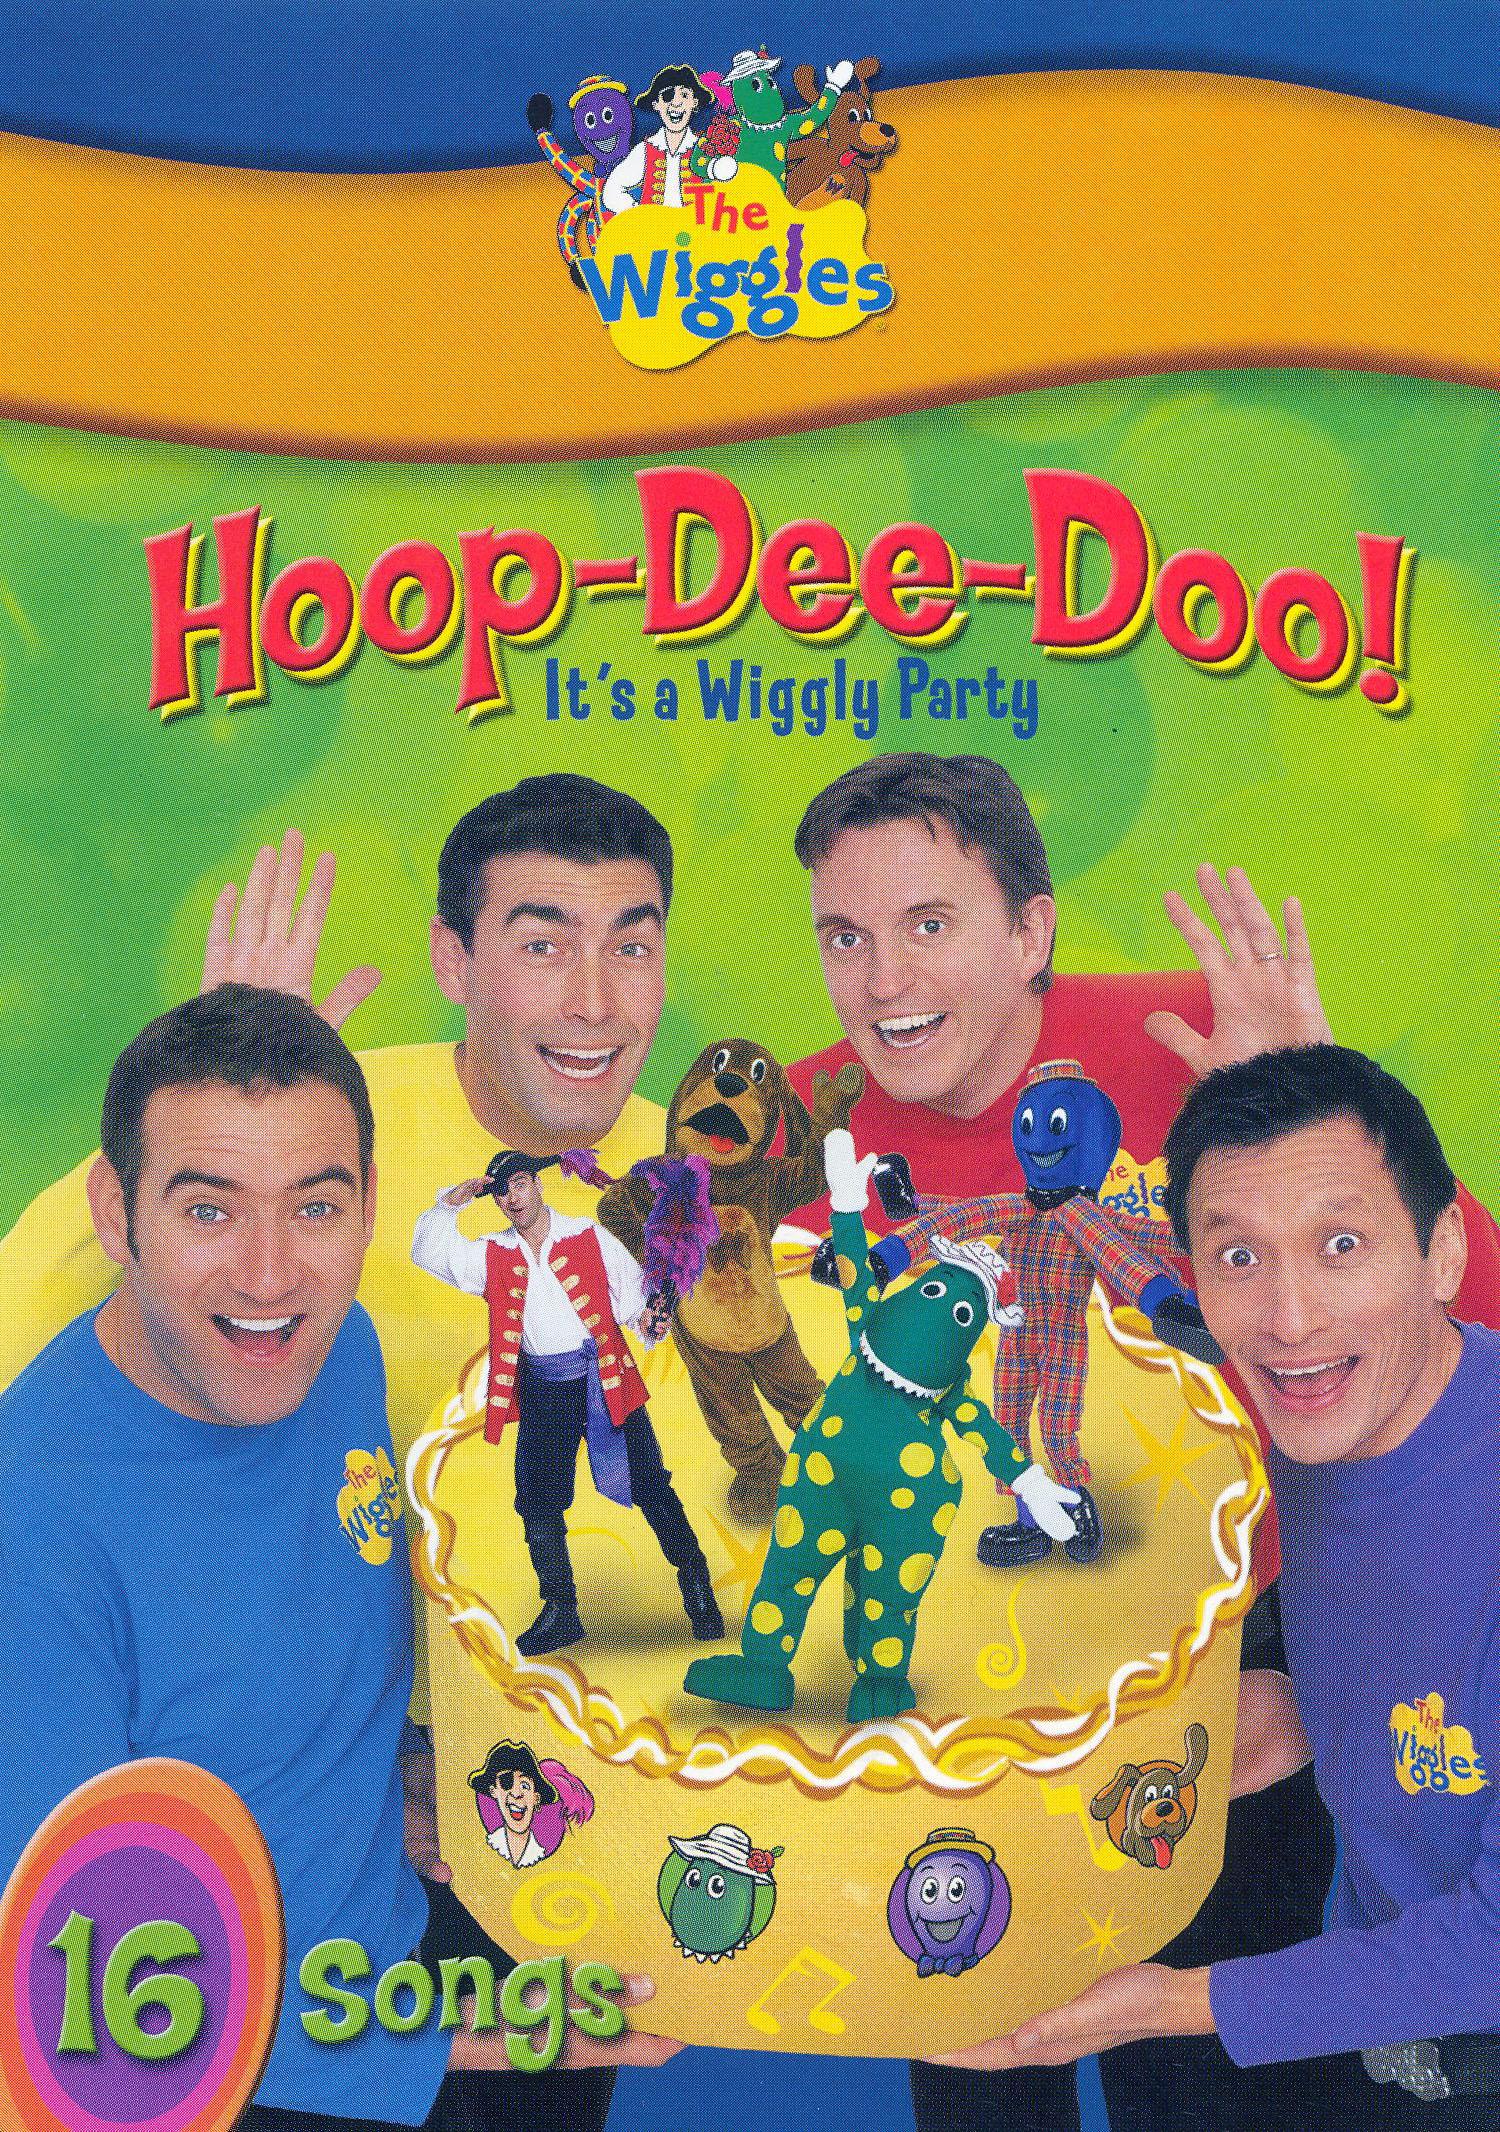 The Wiggles: Hoop Dee Doo! It's a Wiggly Party